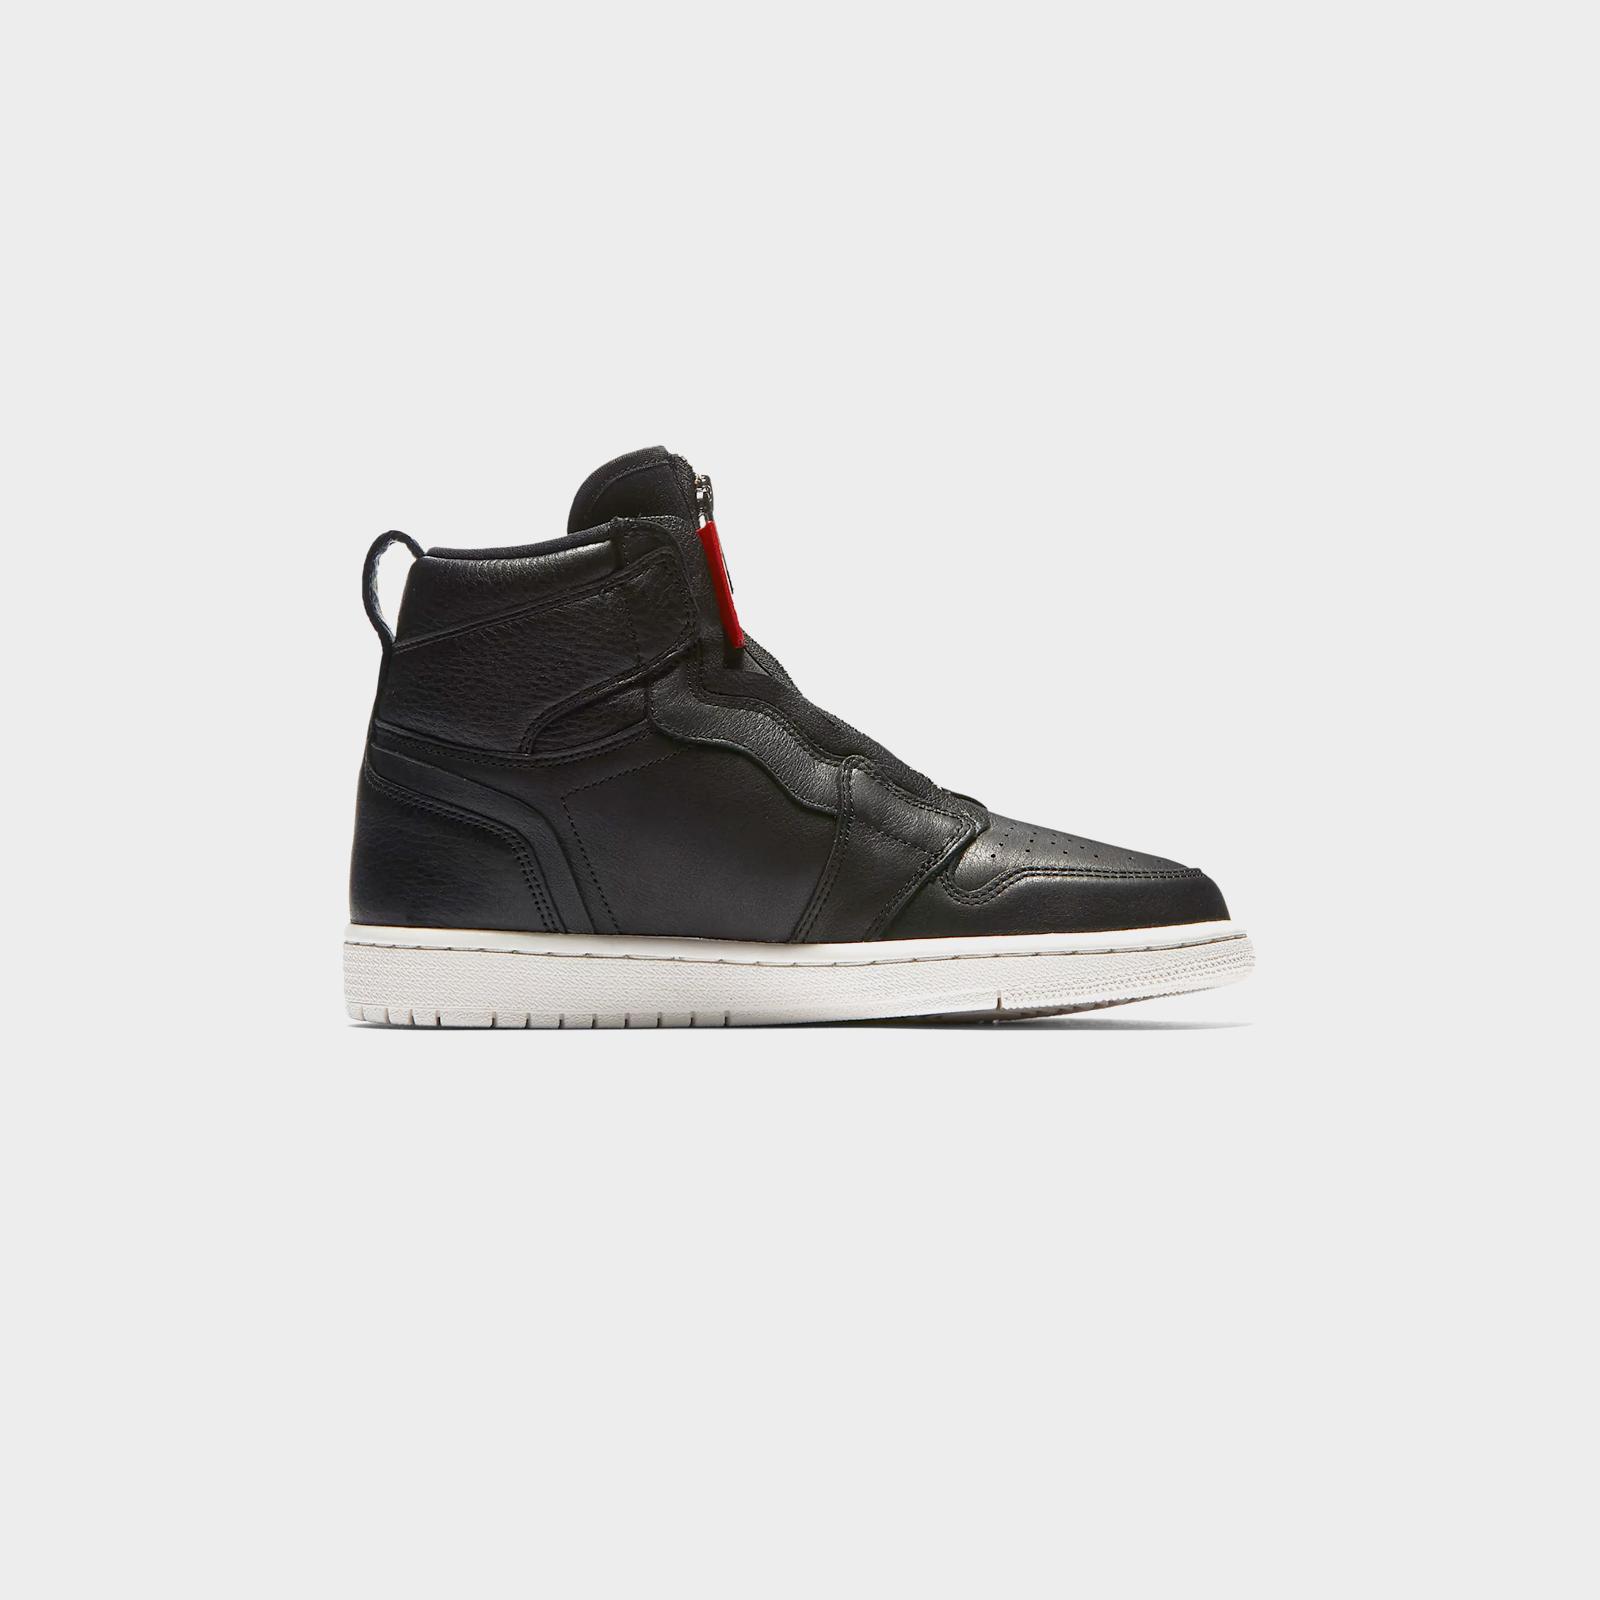 684f6cc1a3a Jordan Brand Air Jordan 1 High Zip - At0575-006 - Sneakersnstuff   sneakers  & streetwear online since 1999